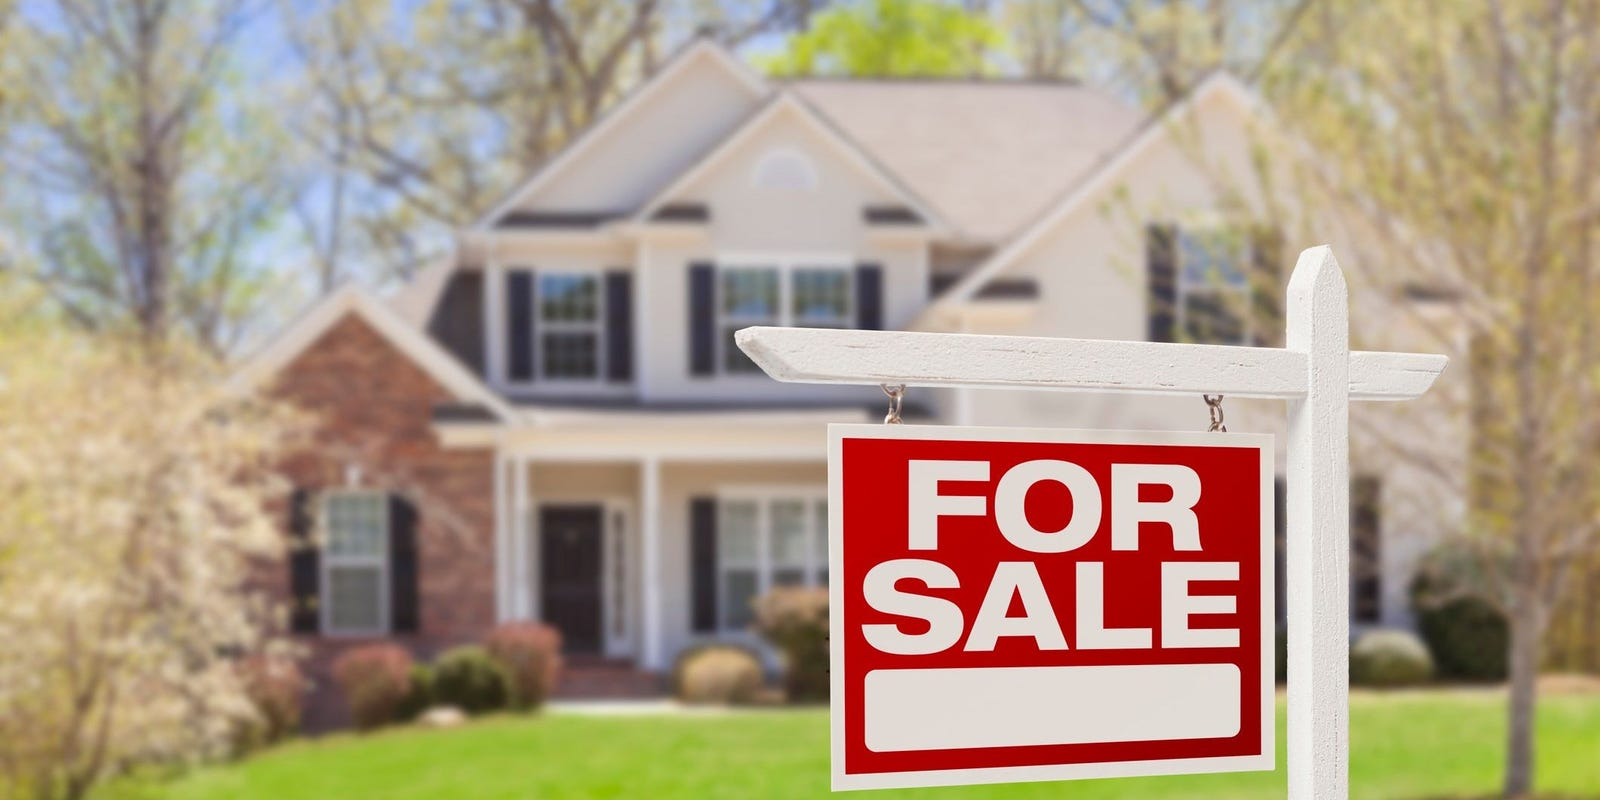 Plunging home sales in wake of coronavirus should rebound in 2021